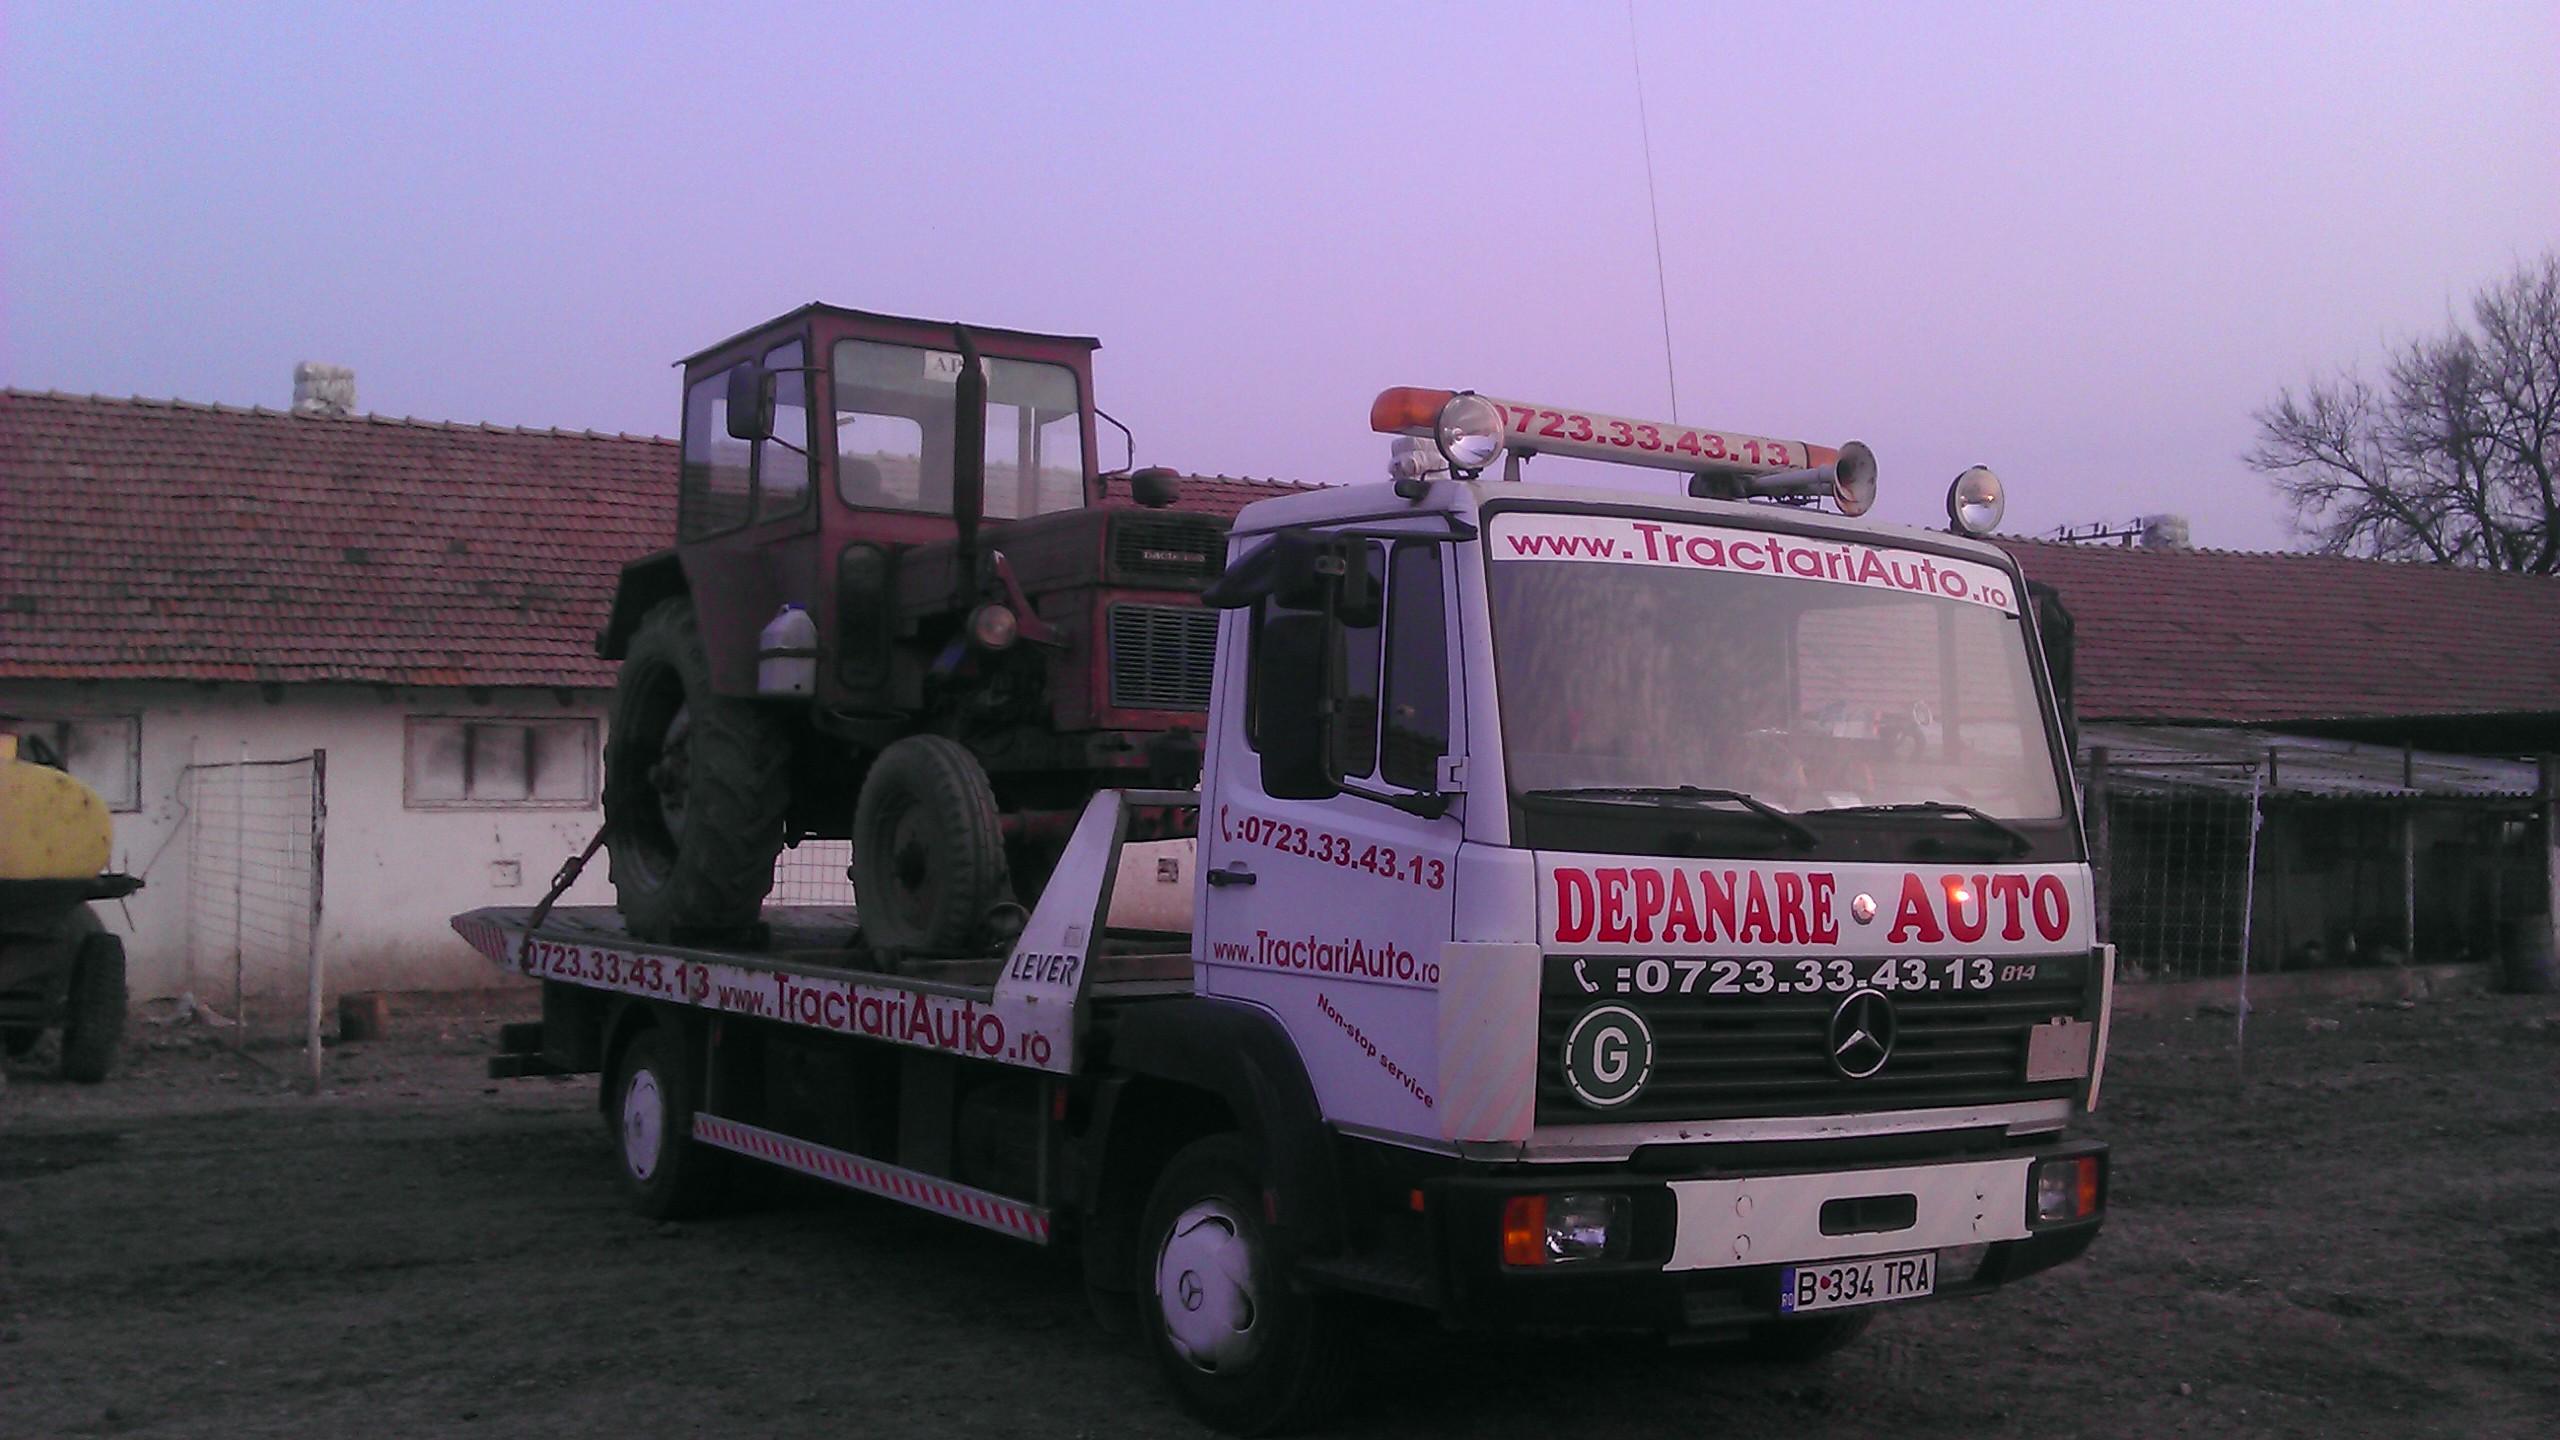 Reduceri la tractari tractoare si transport utilaje agricole